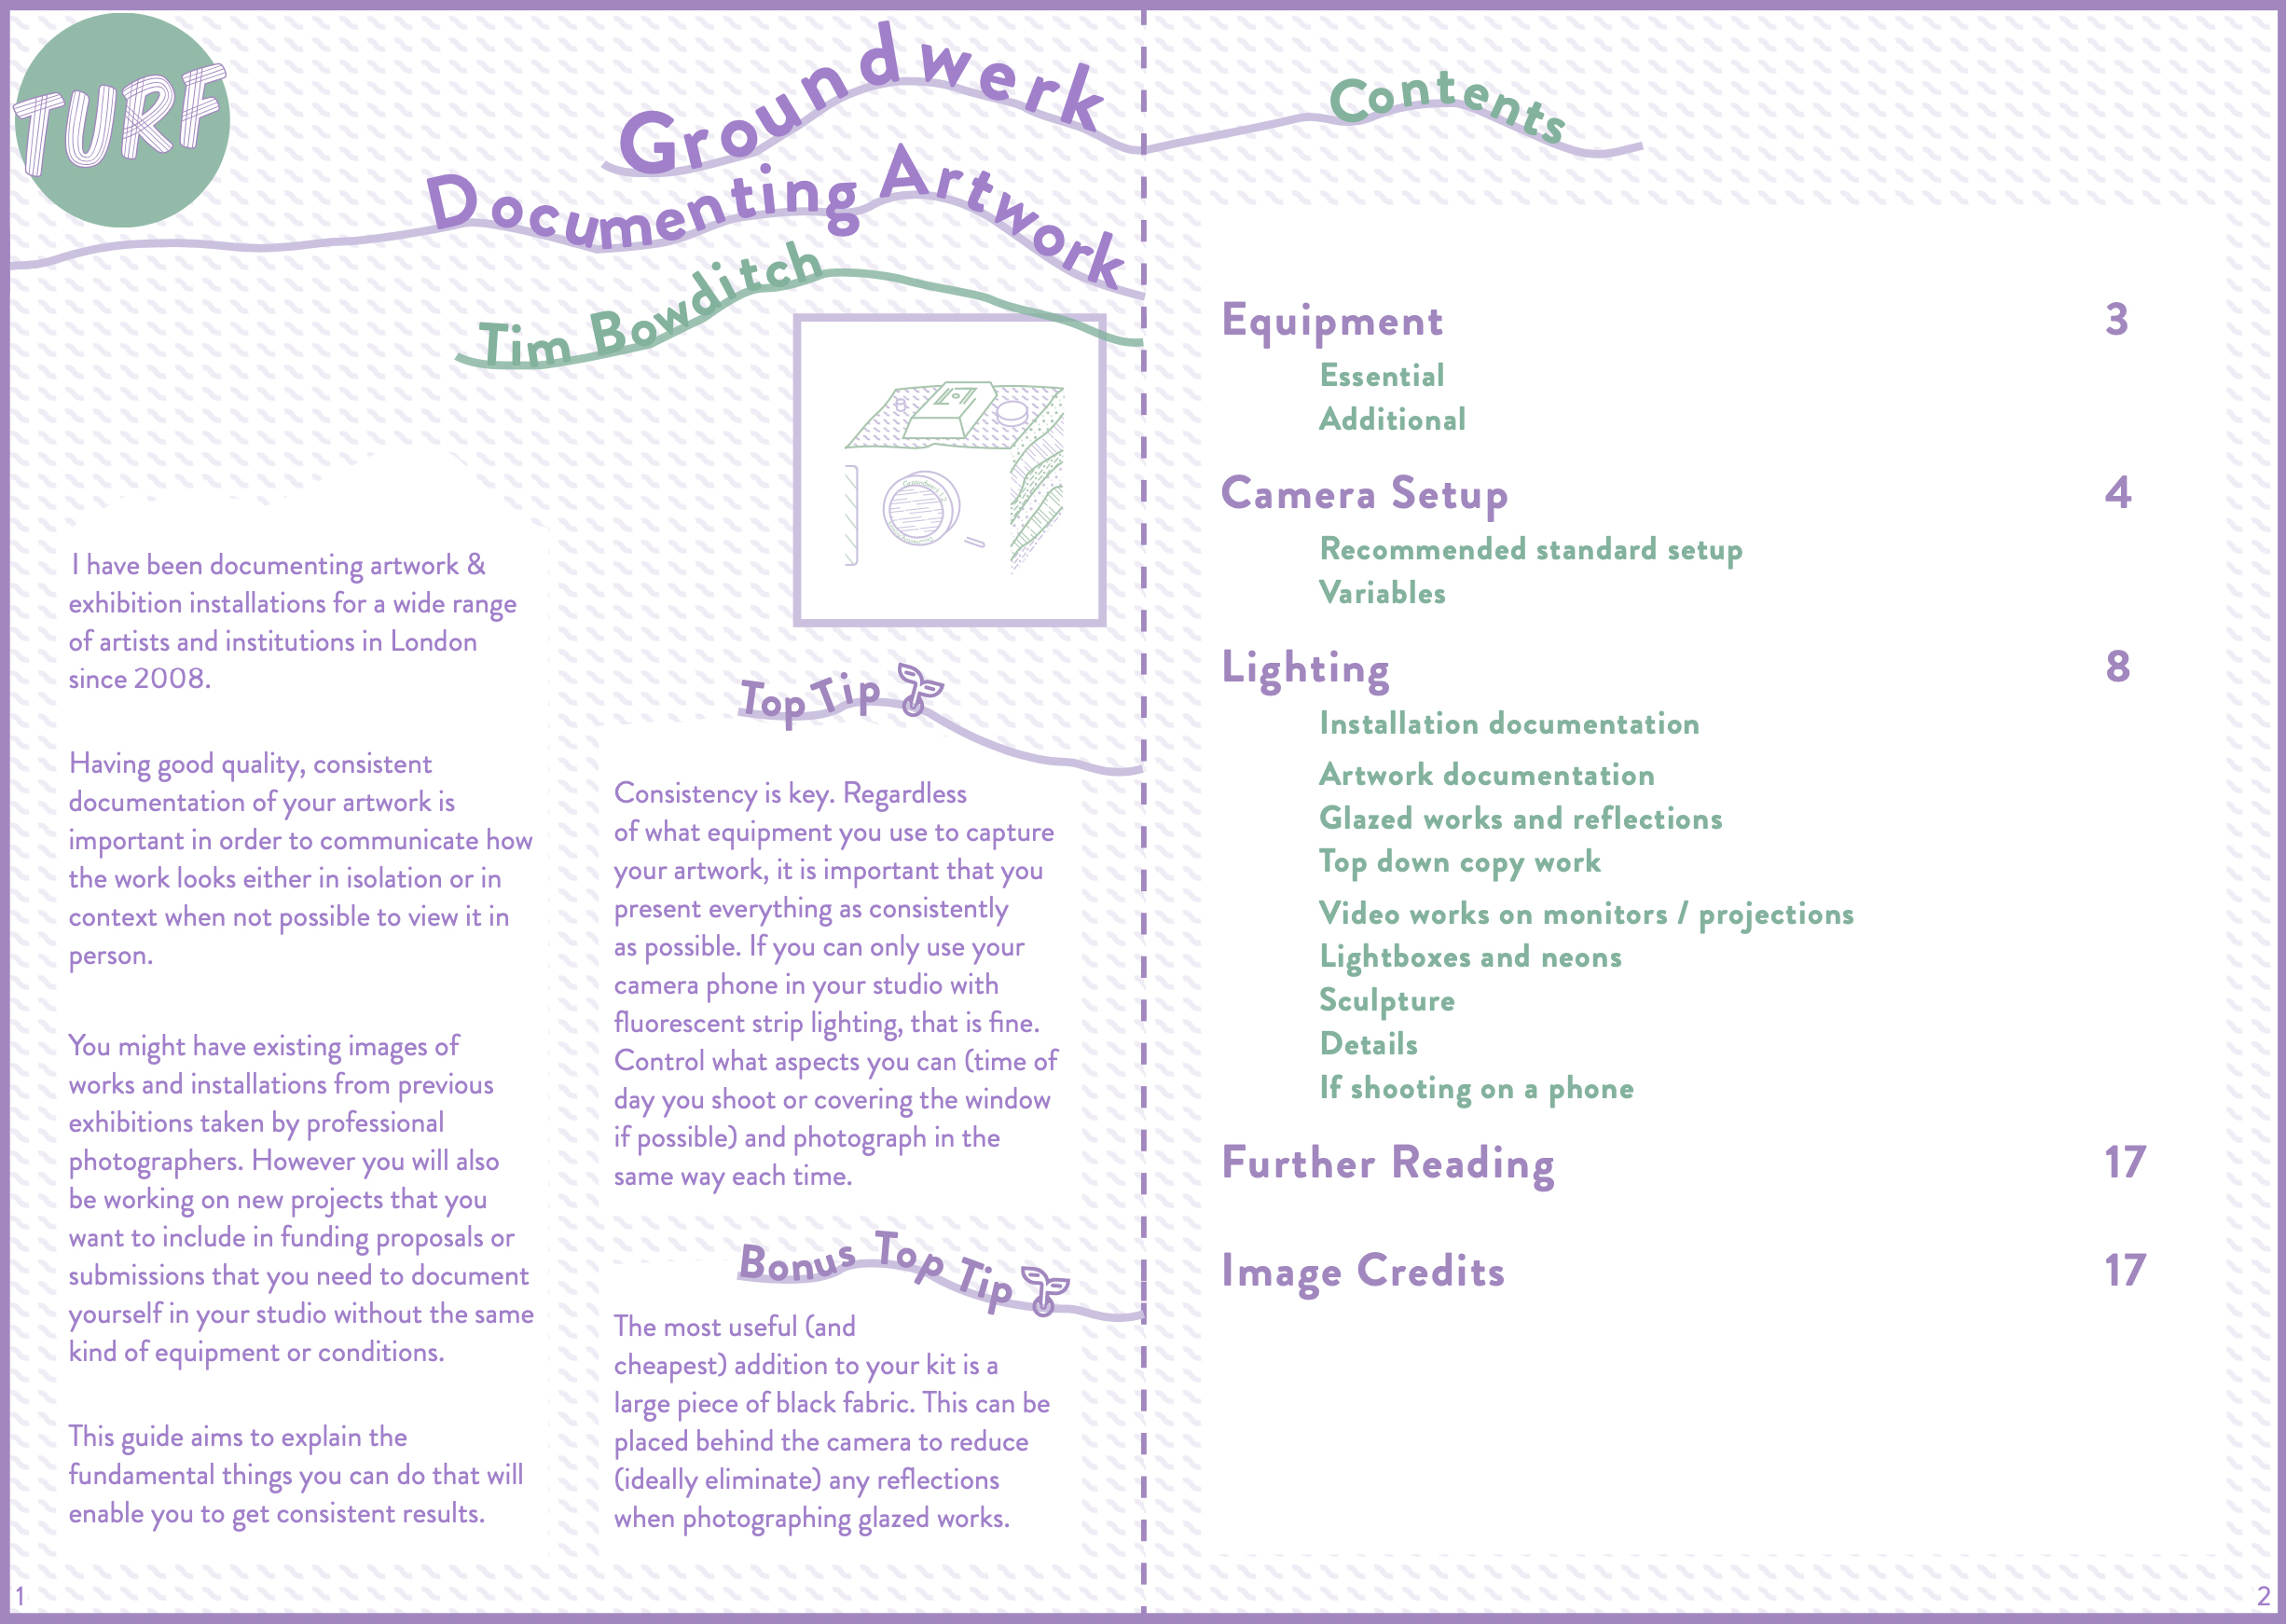 Groundwerk-Manual-Documenting-Artwork-preview.jpg